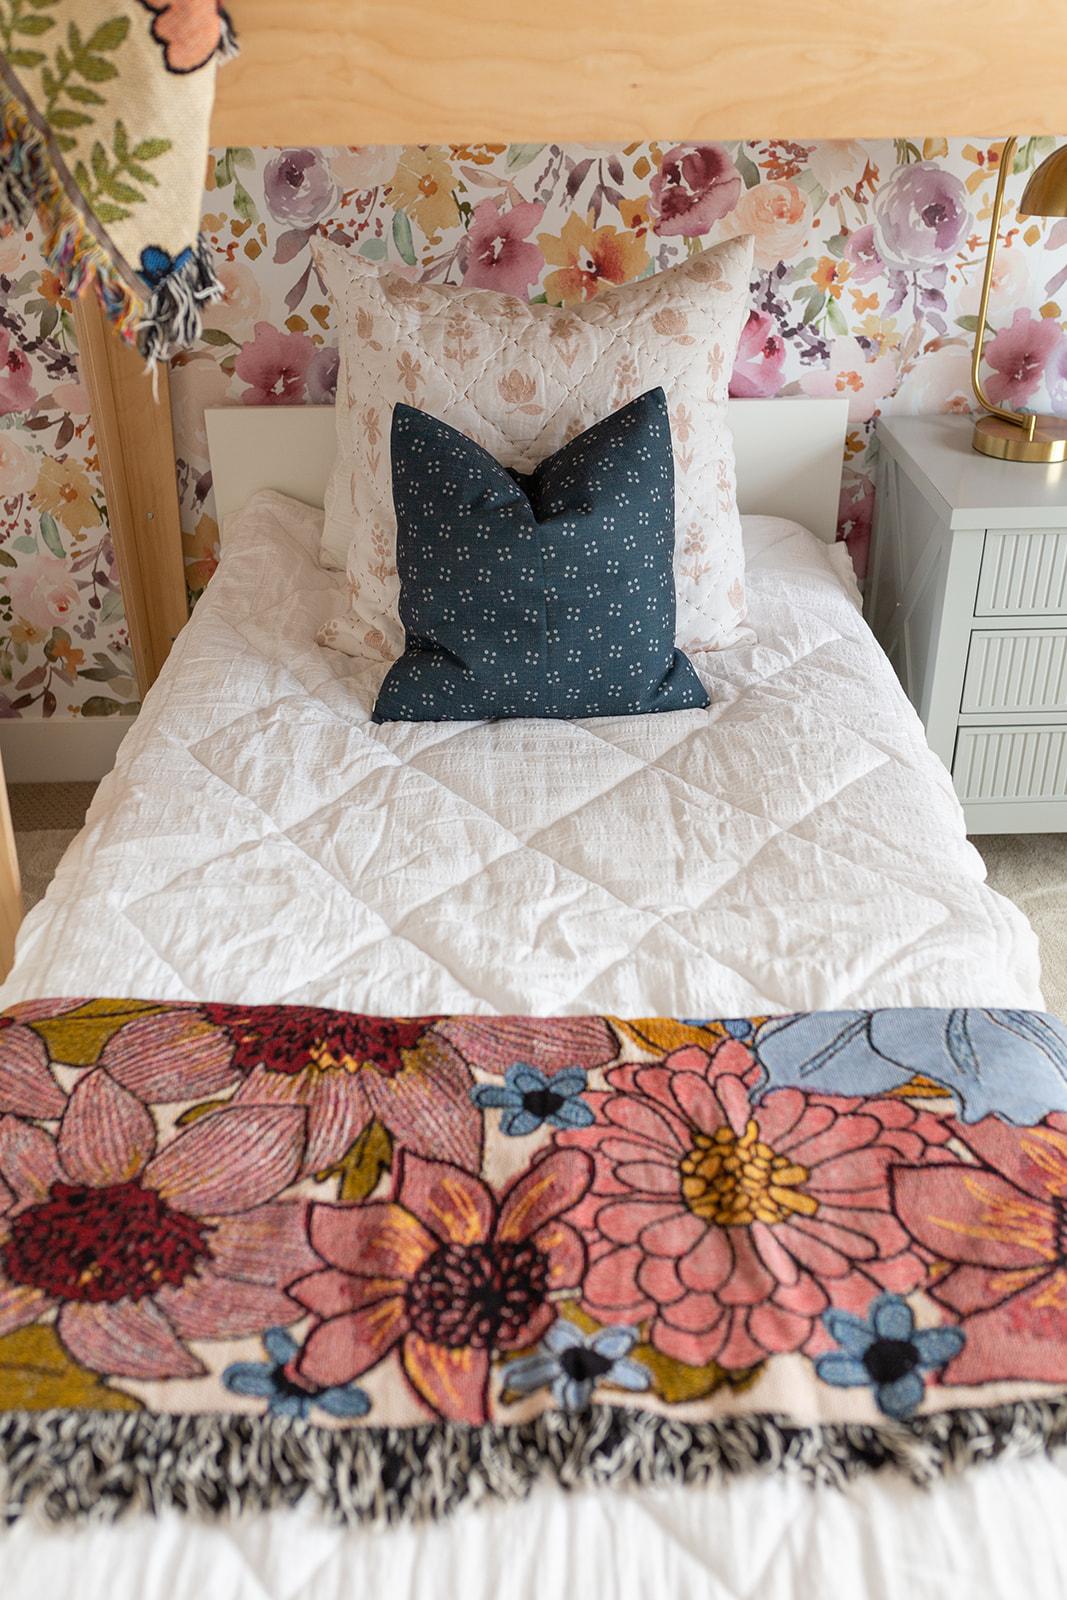 the bedding is so gorgeous www.twistmepretty.com